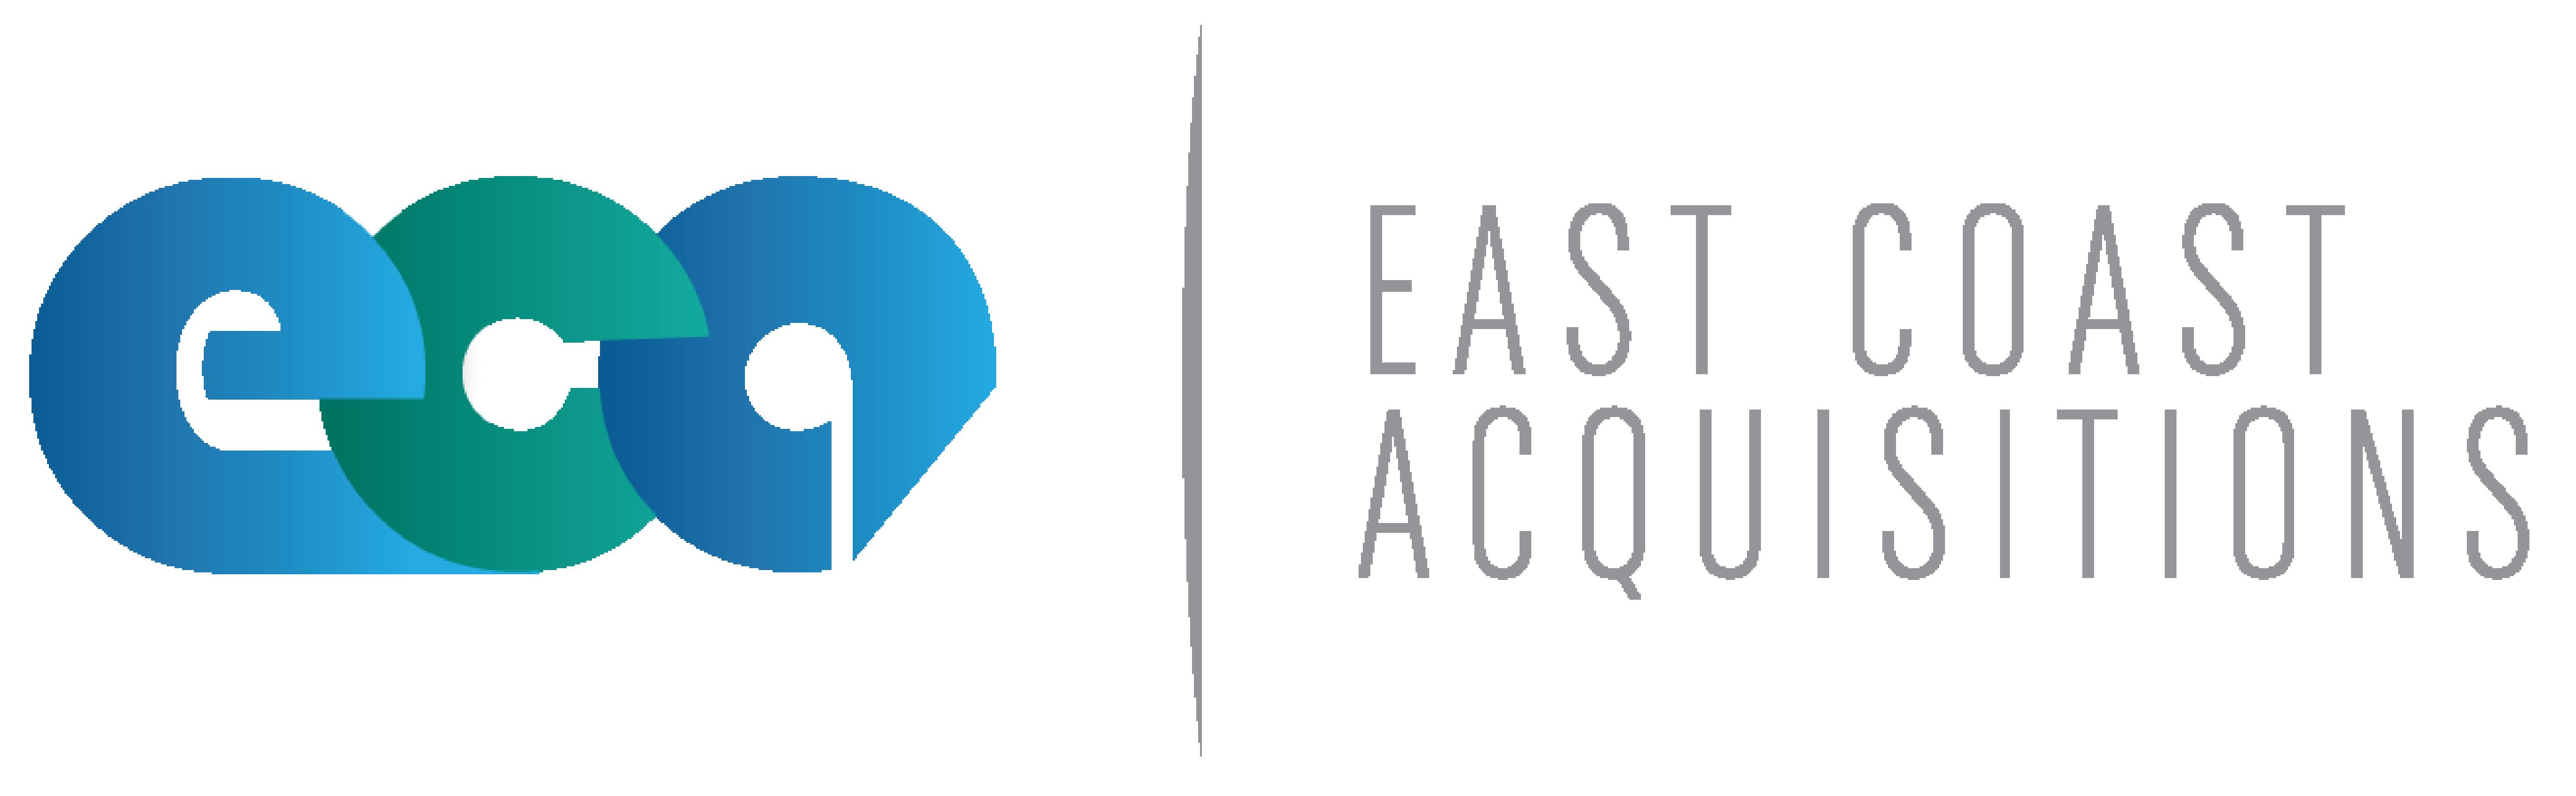 East Coast Acquisitions-